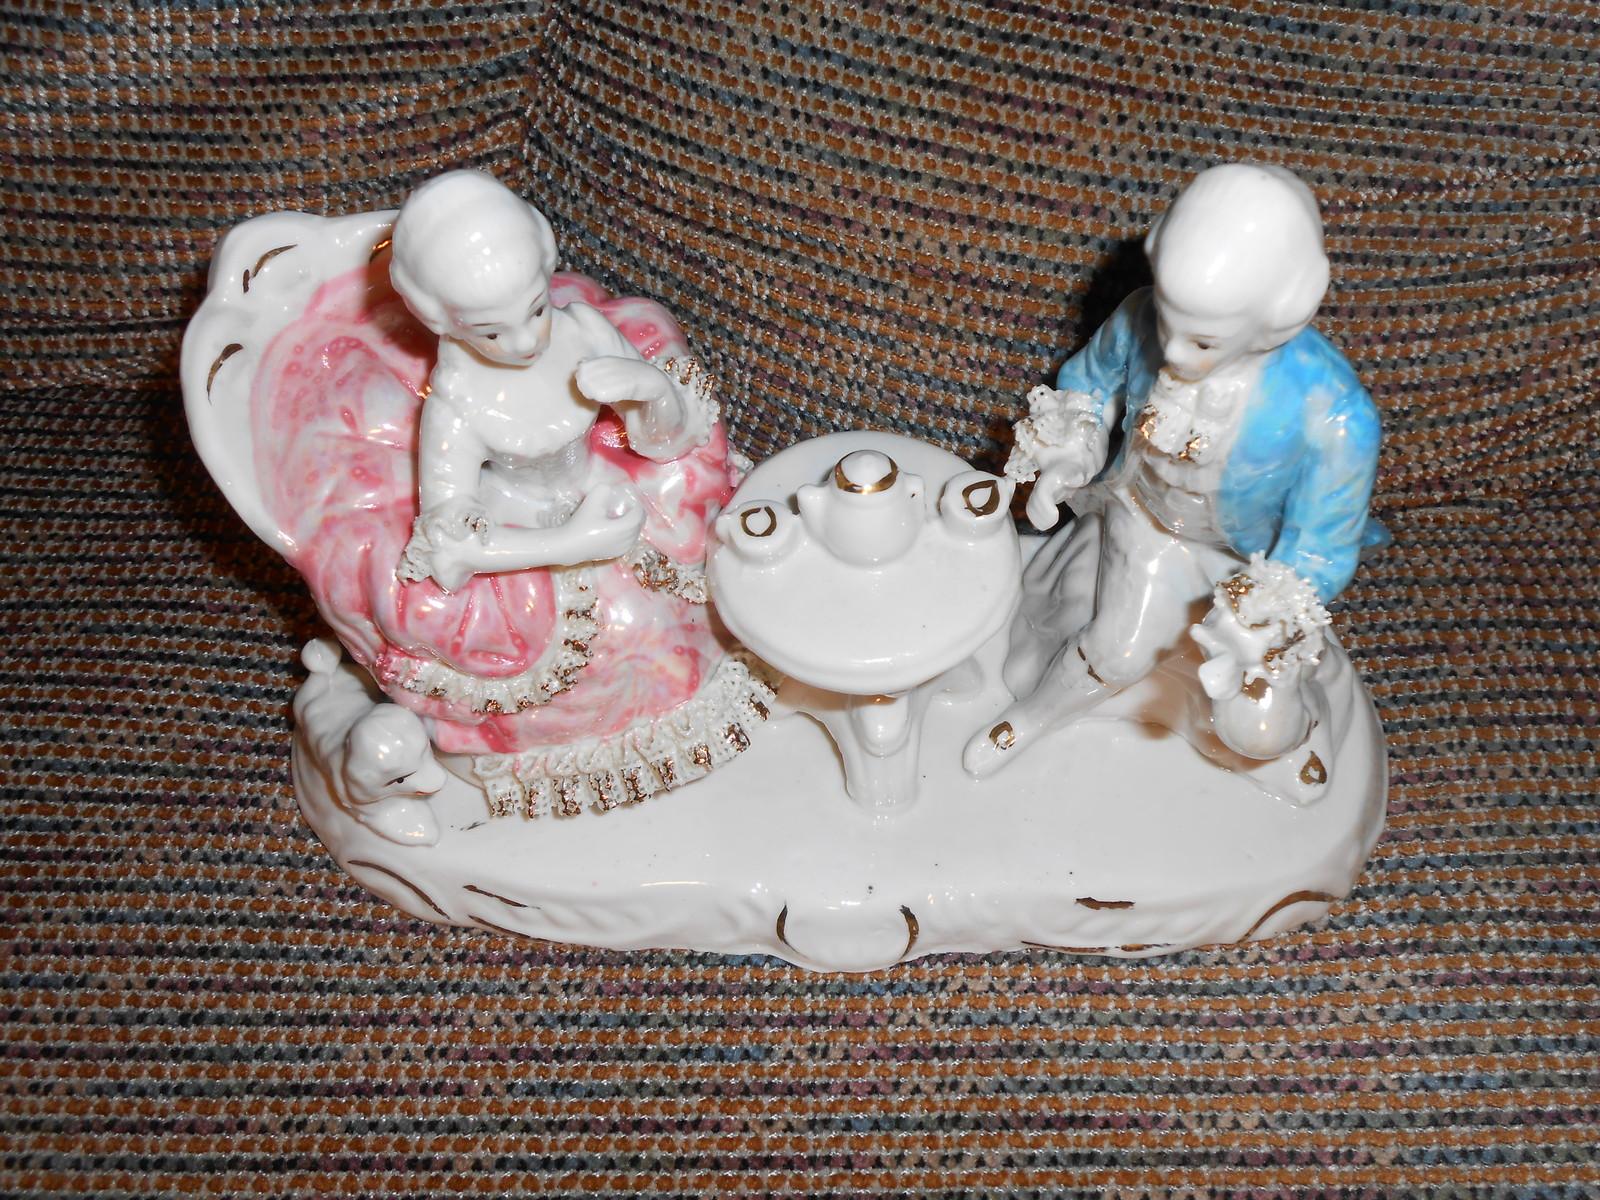 Vintage Tea for Two Large Ceramic Figurine